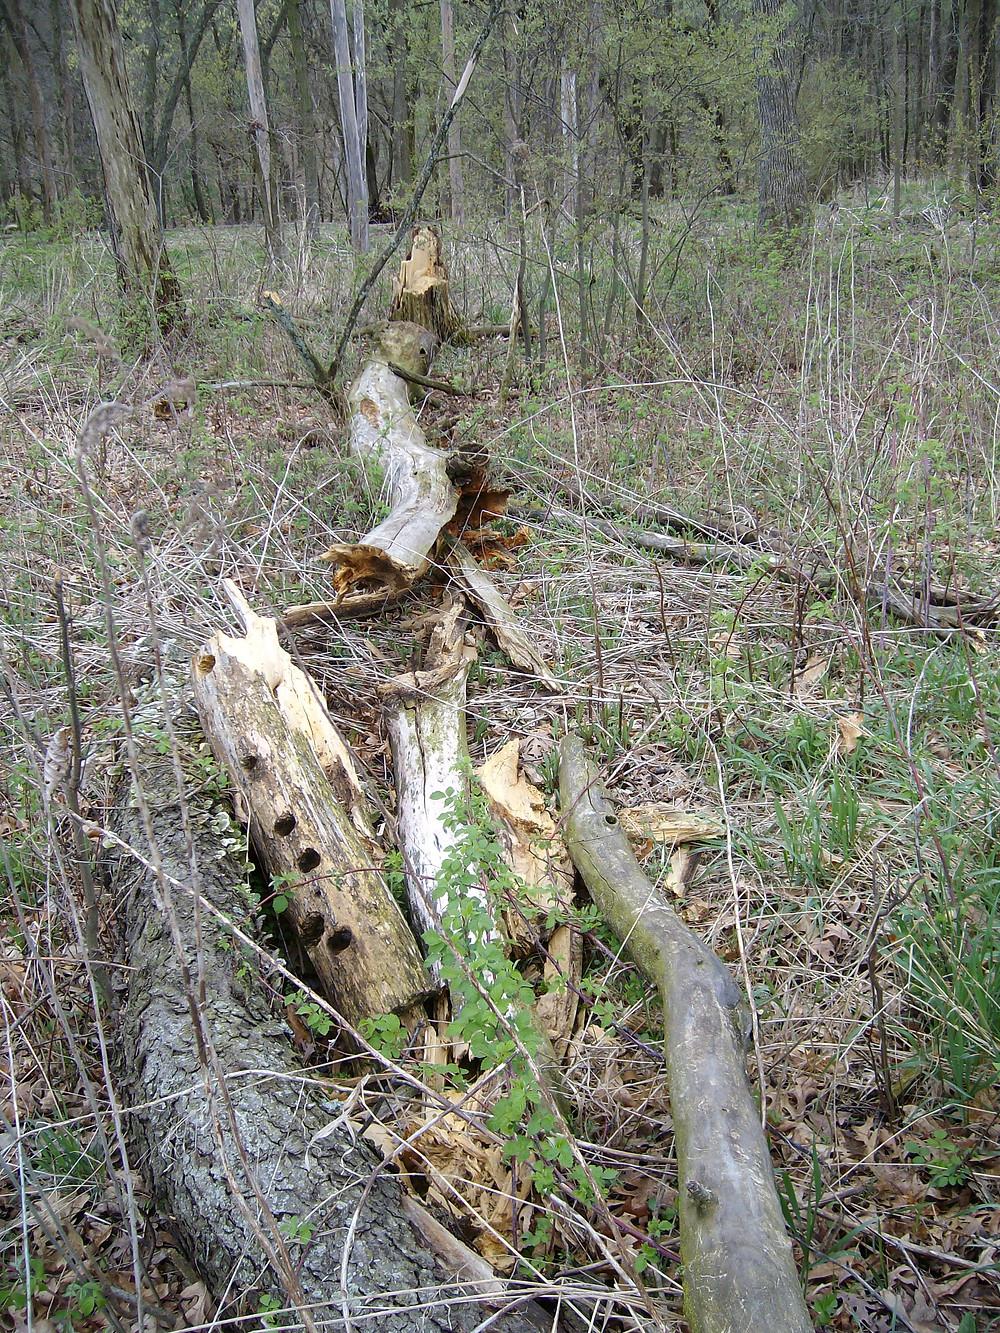 A fallen wildlife tree.